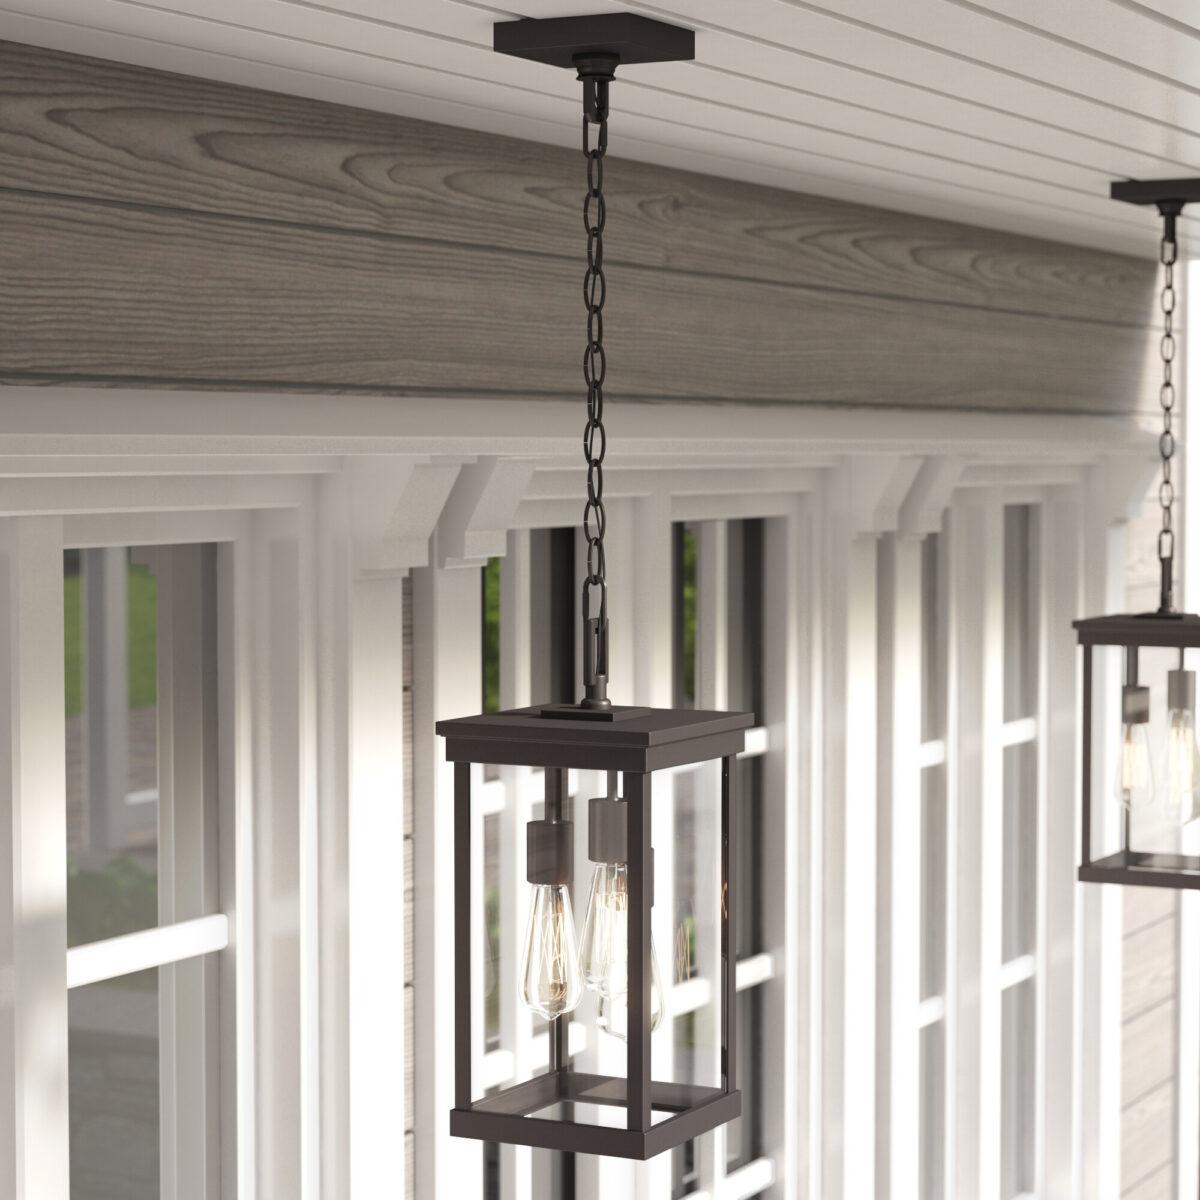 lighting-the-veranda-project-and-ideas-17